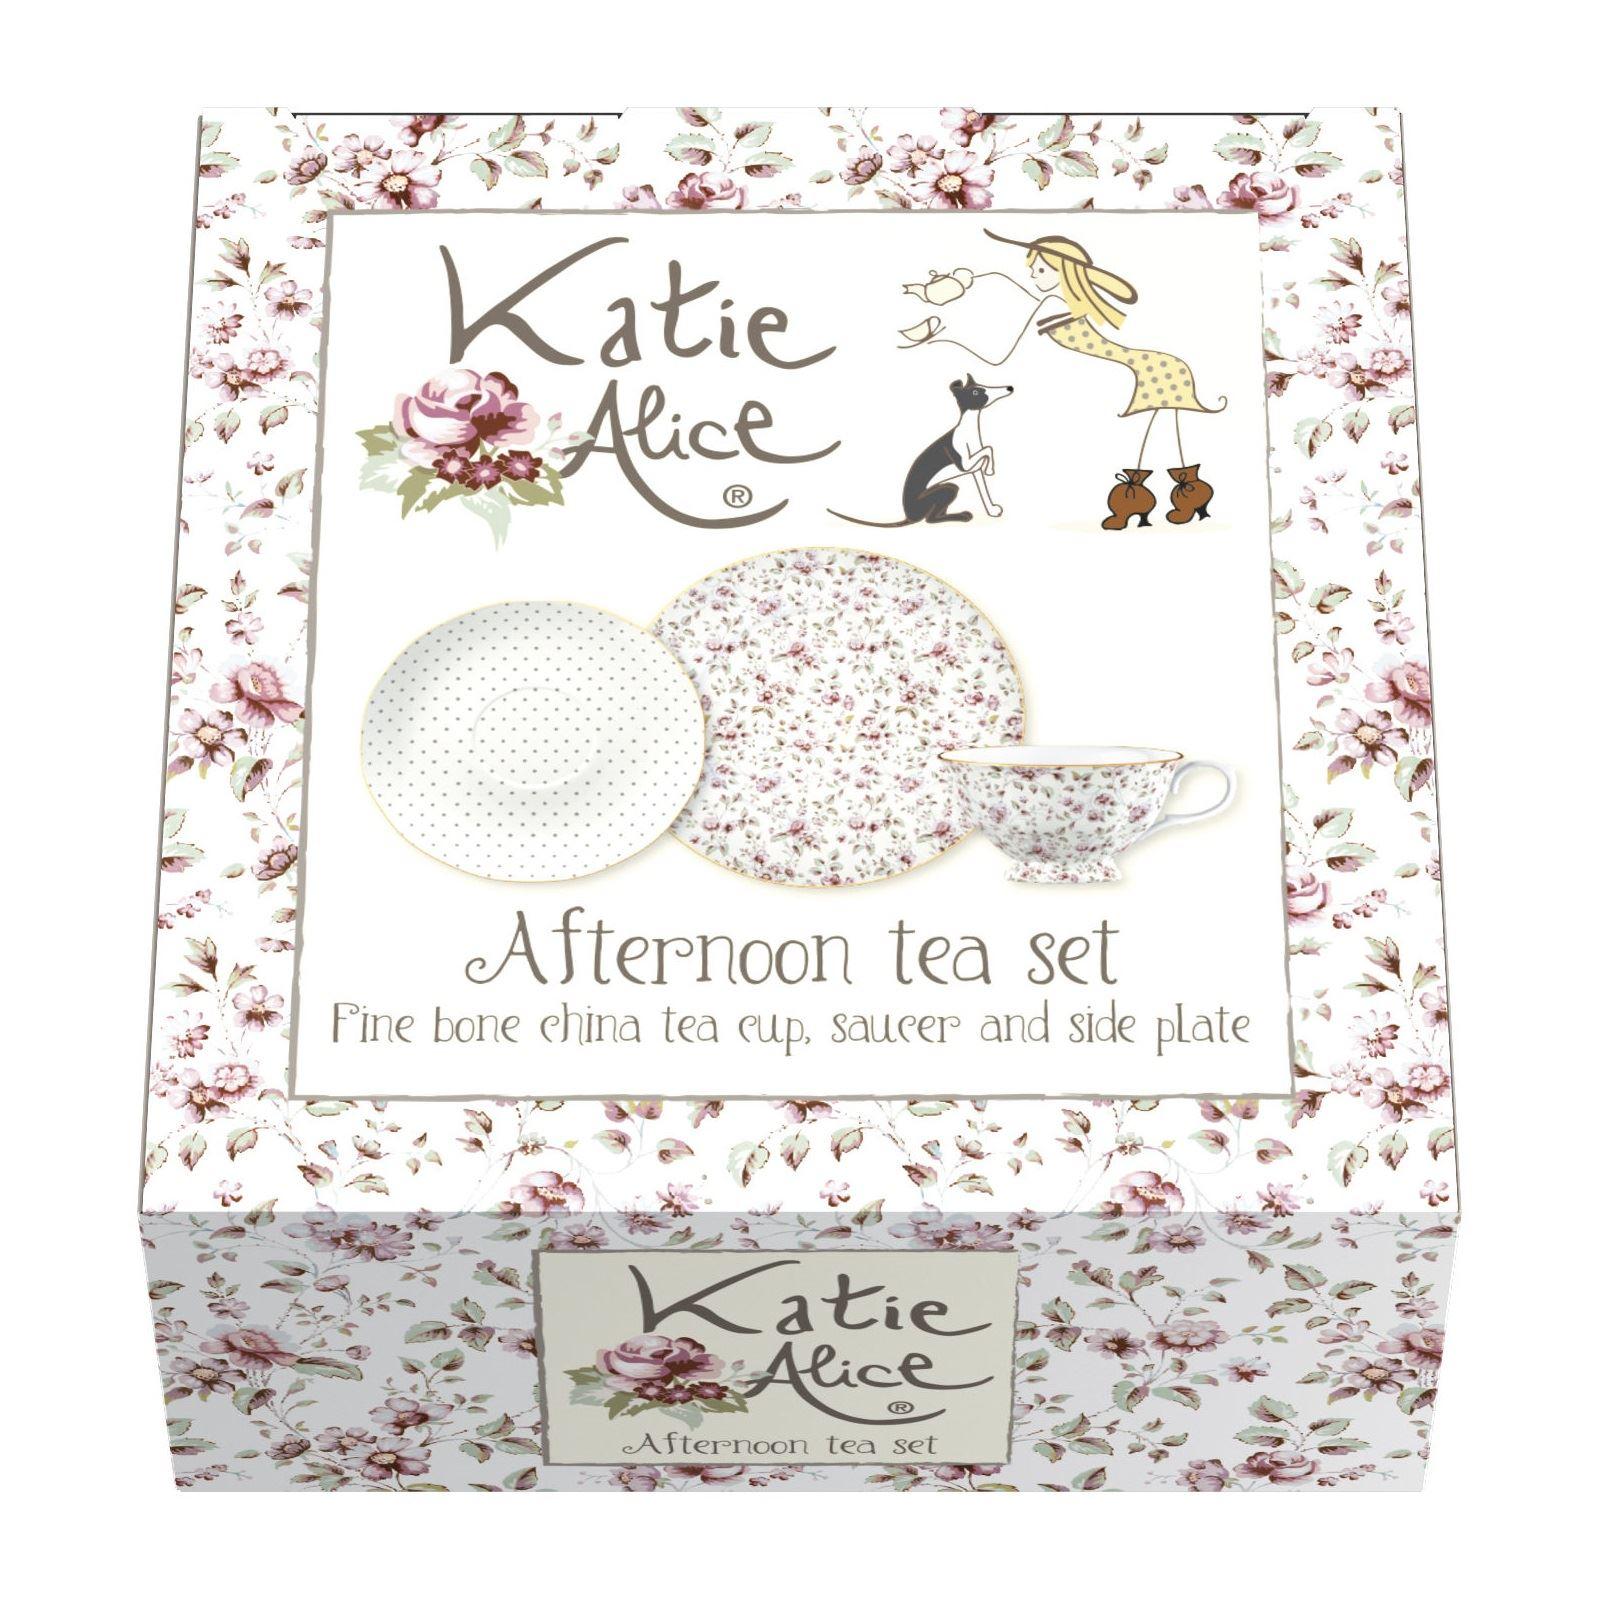 Tableware Serving Linen Katie Alice Ditsy Floral Afternoon Tea Cup Saucer Side Plate Set Gift Box Home Furniture Diy Quatrok Com Br